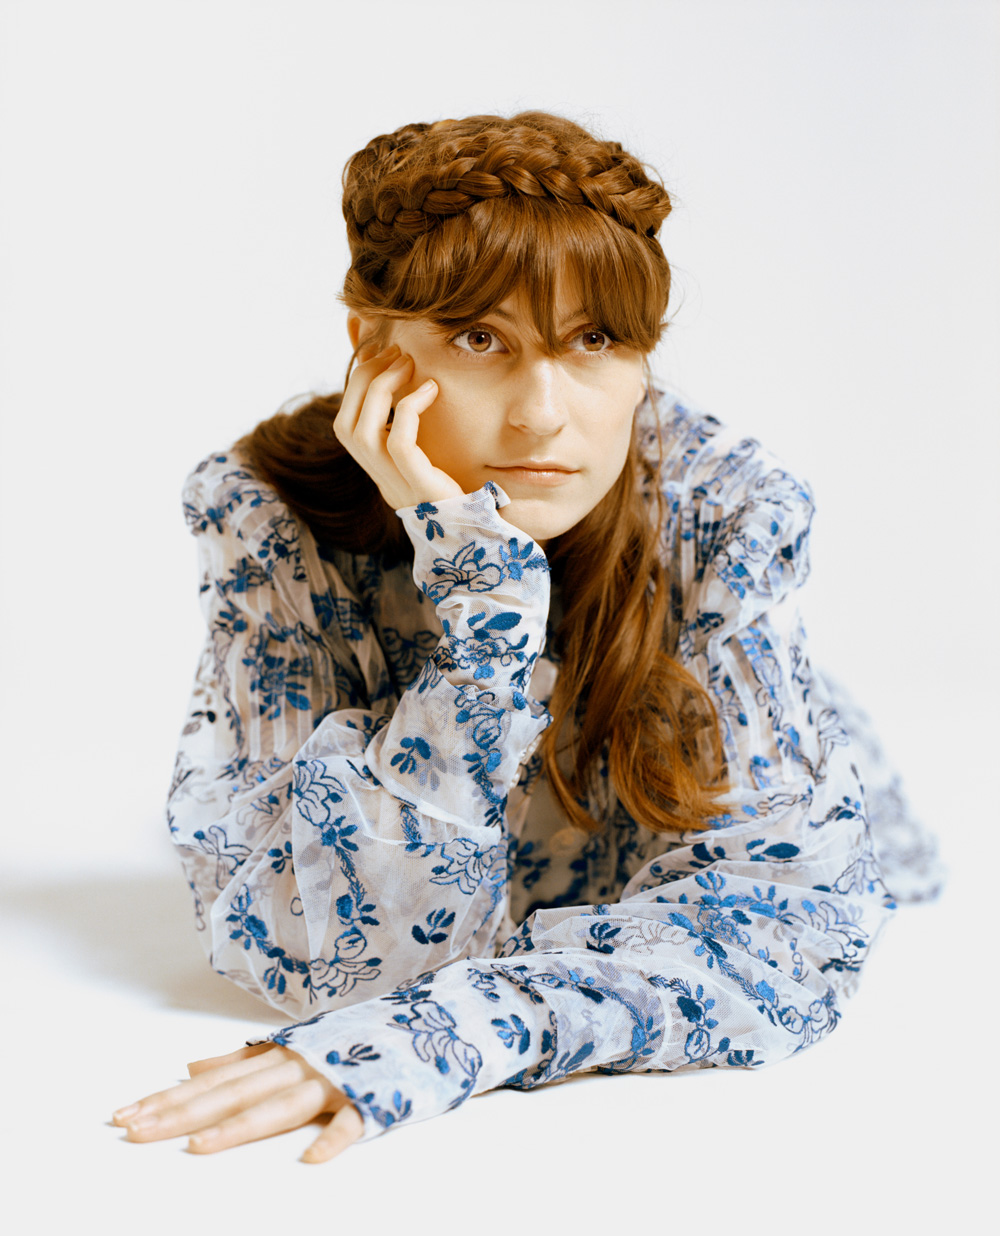 Faye Webster wearing a blue floral jacket from Simone Rocha